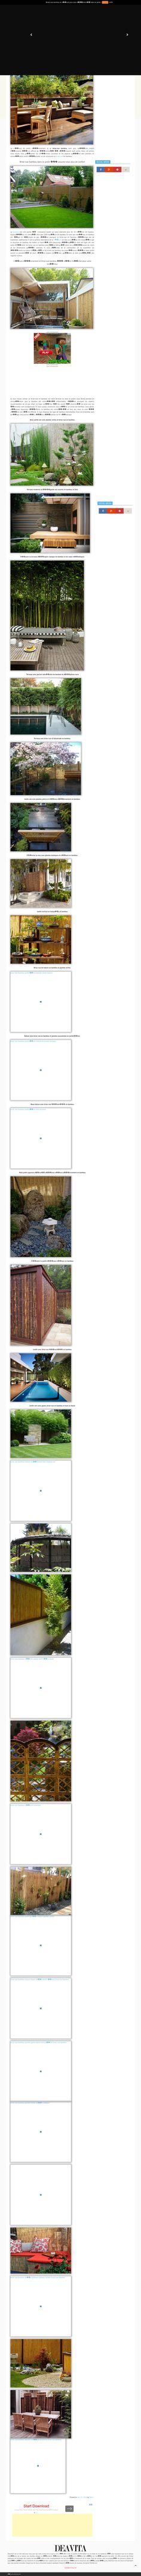 Website'http%3A%2F%2Fdeavita.fr%2Fdesign-exterieur%2Fjardin-deco%2Fbrise-vue-bambou-intimite-jardin%2F' snapped on Page2images!